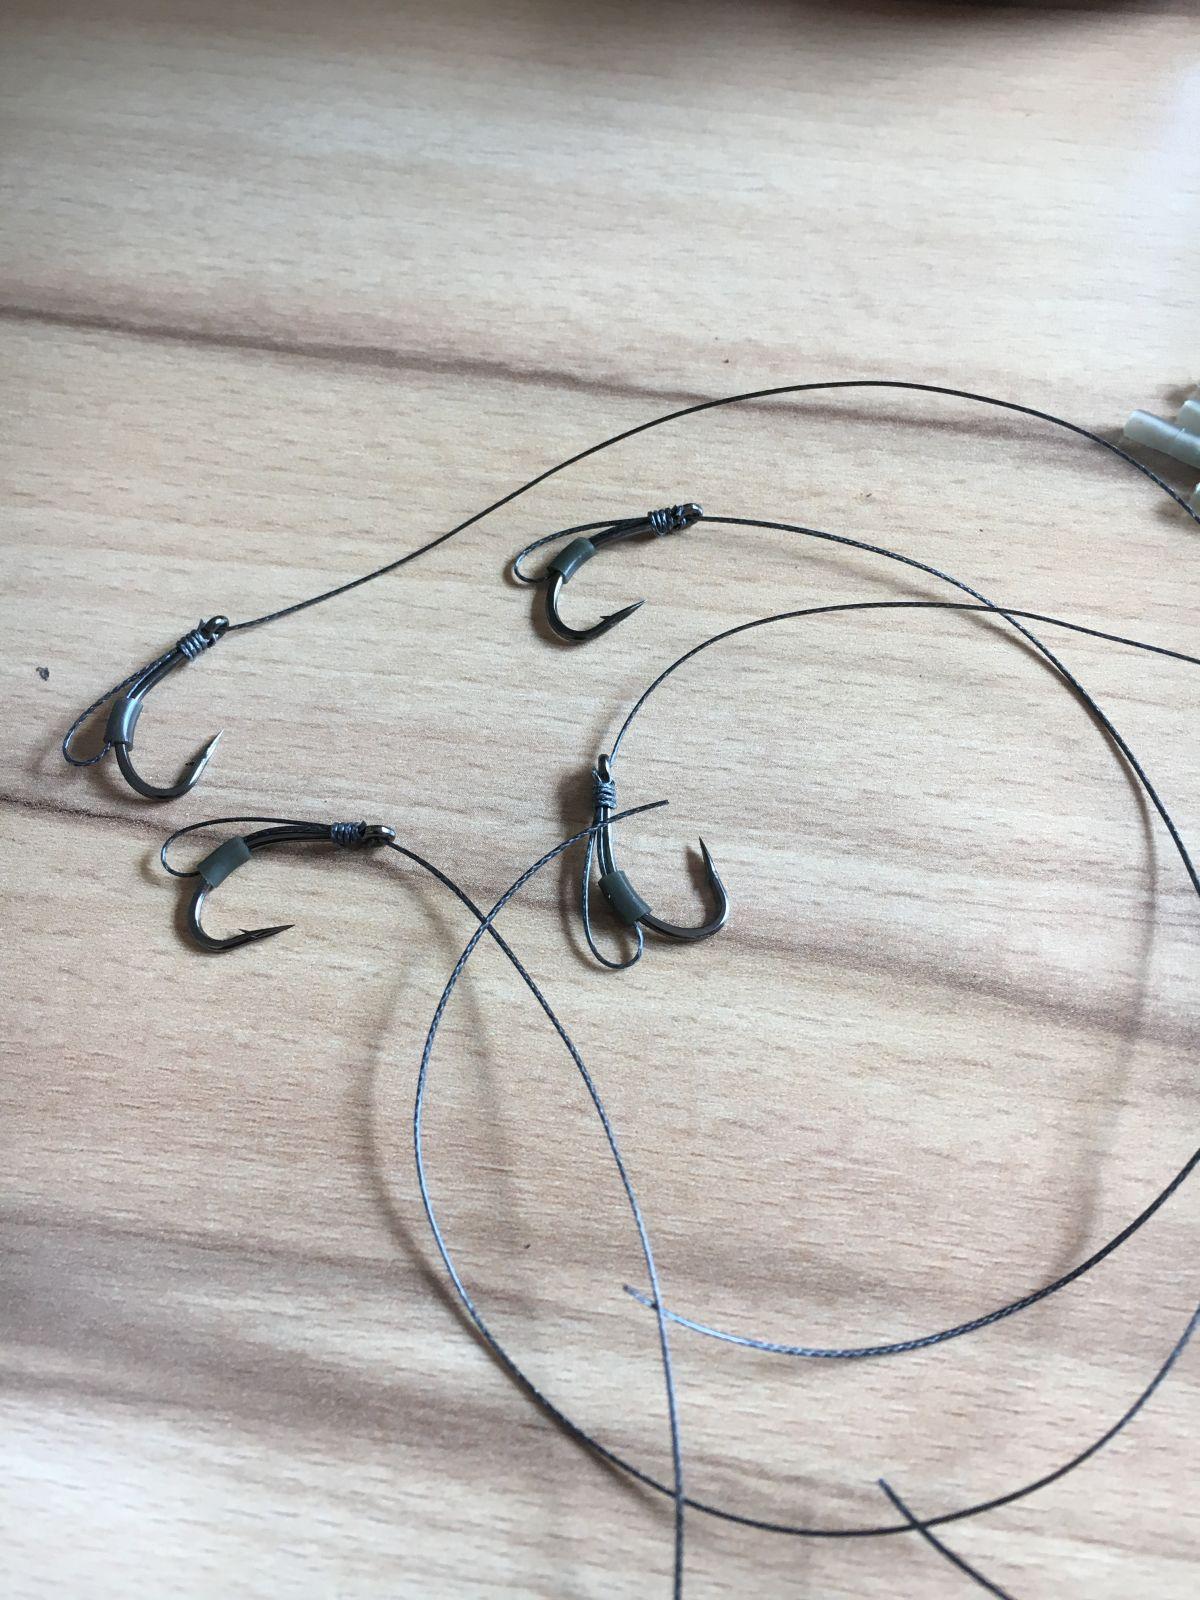 D-Rig Karpfenangeln